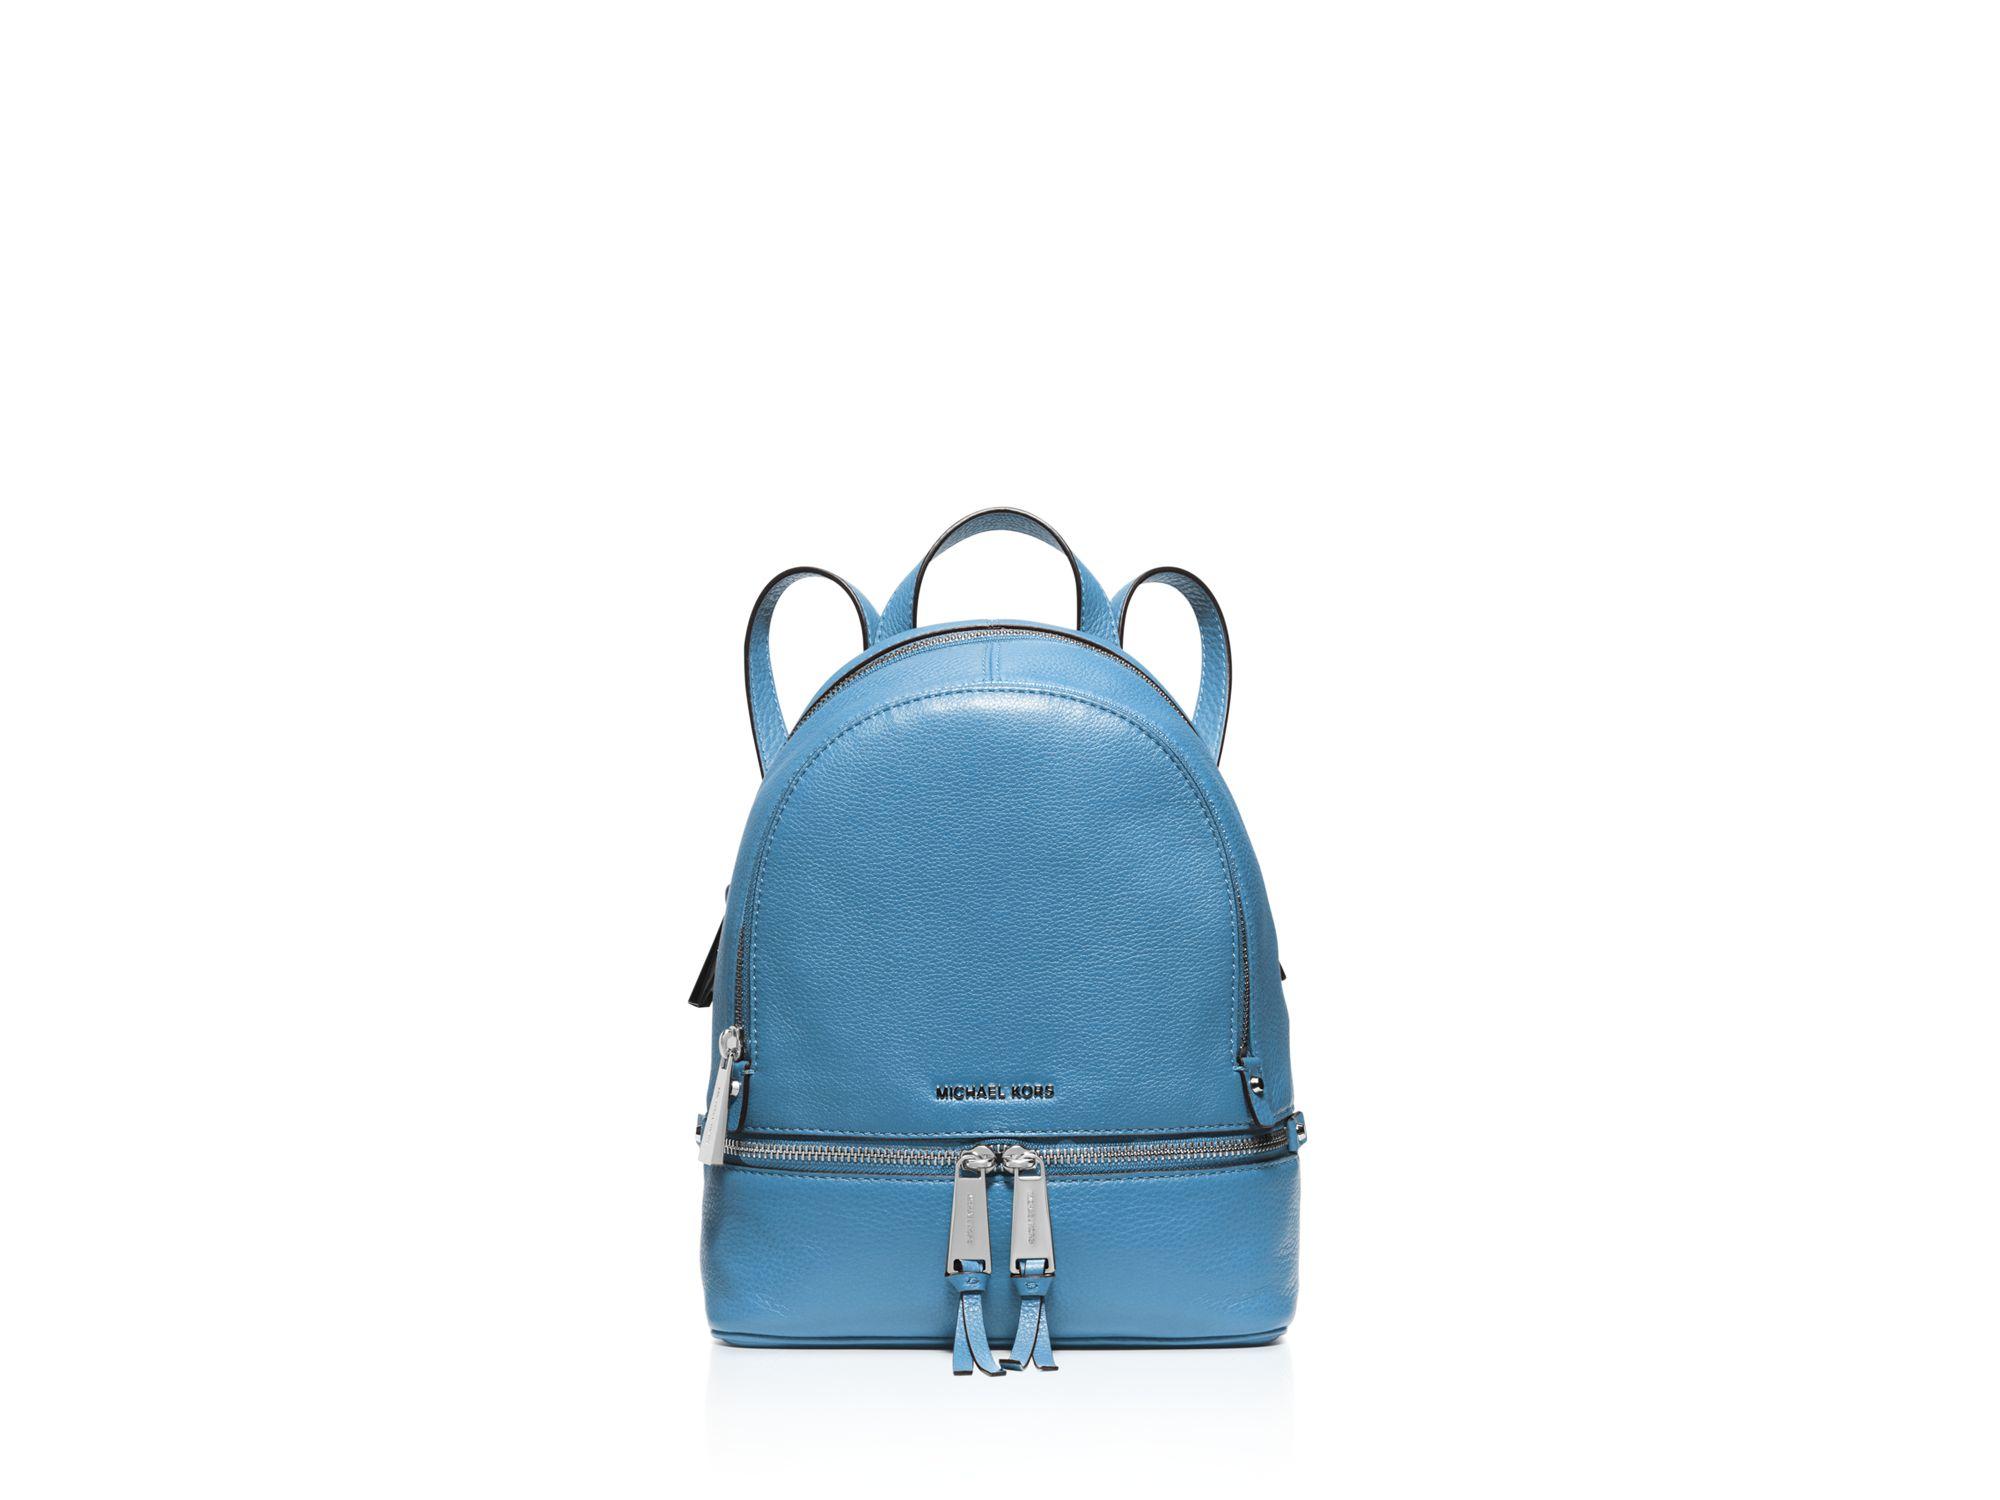 5635c4c465 MICHAEL Michael Kors Extra Small Rhea Zip Backpack in Blue - Lyst